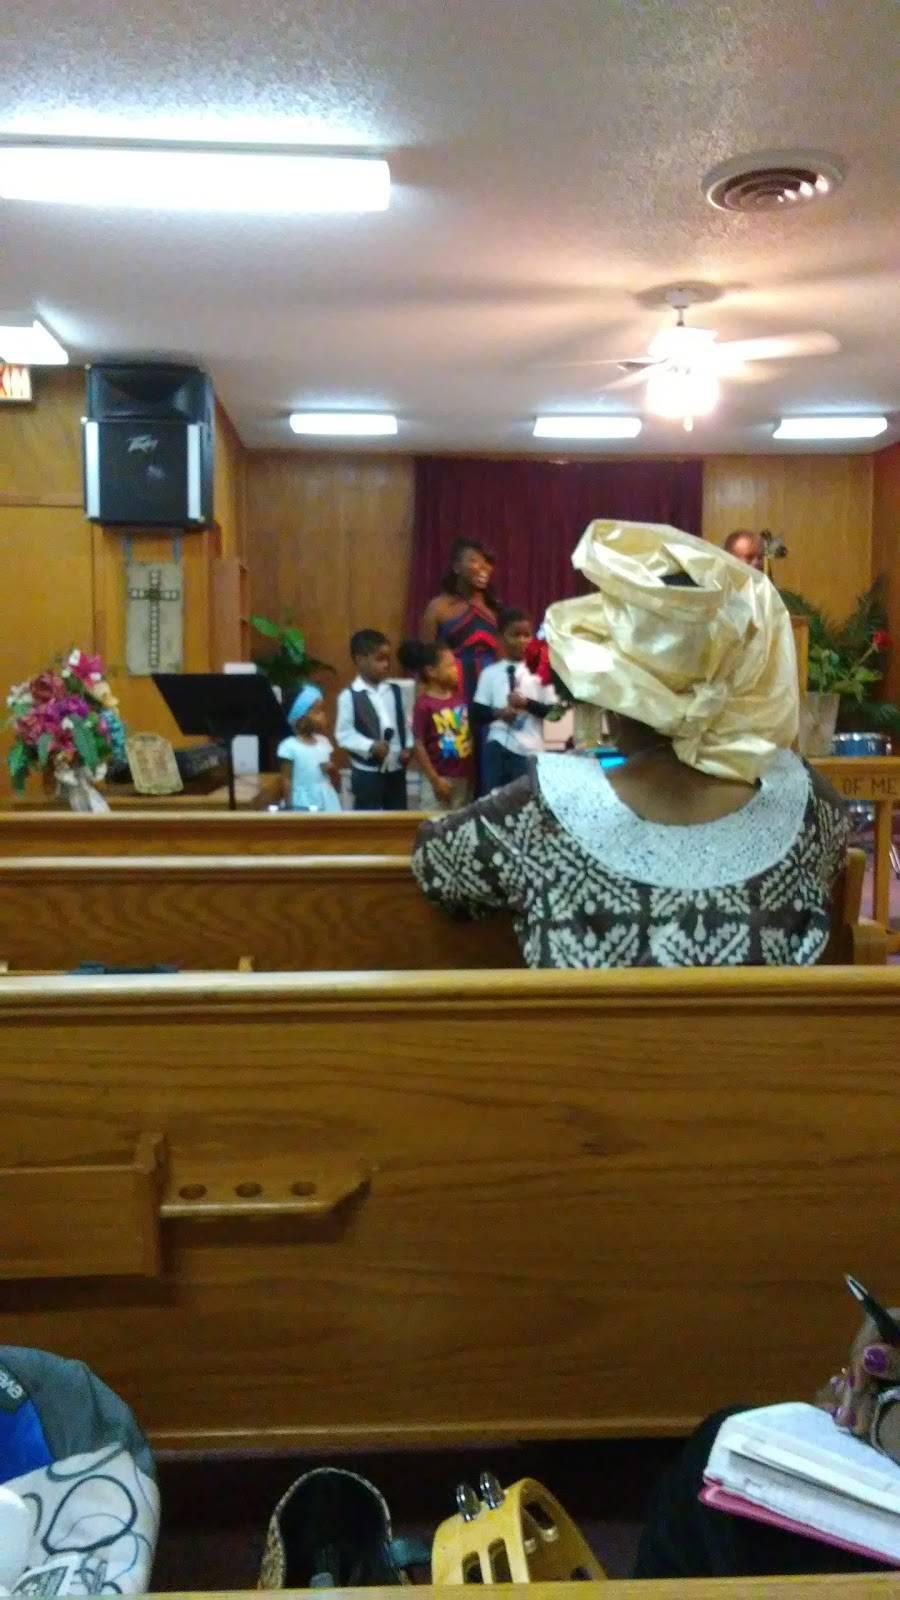 Westside Victory Baptist Church - church  | Photo 2 of 2 | Address: Fort Worth, TX 76114, USA | Phone: (817) 738-4976